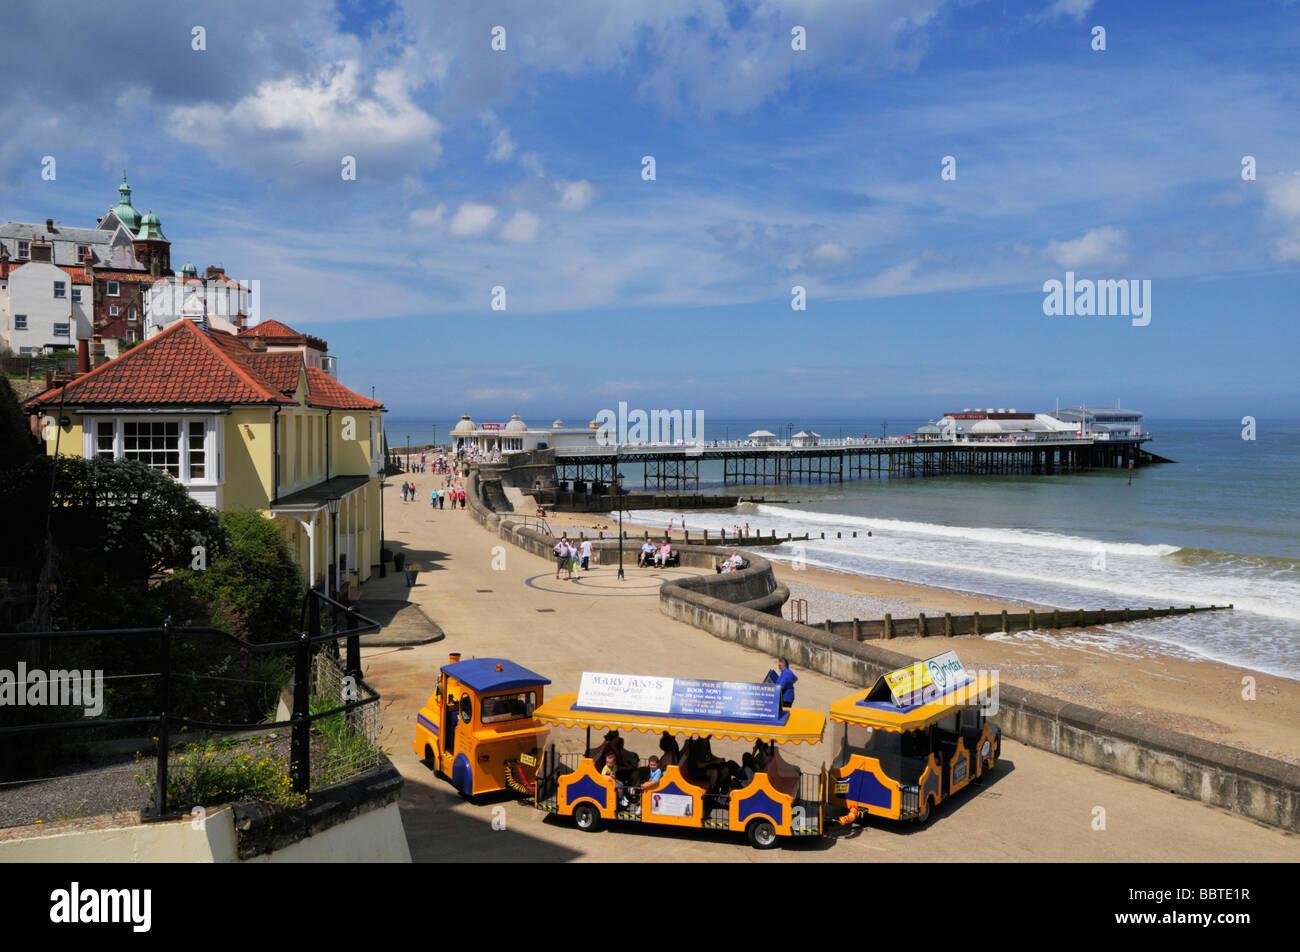 The Pier at Cromer Norfolk England UK - Stock Image